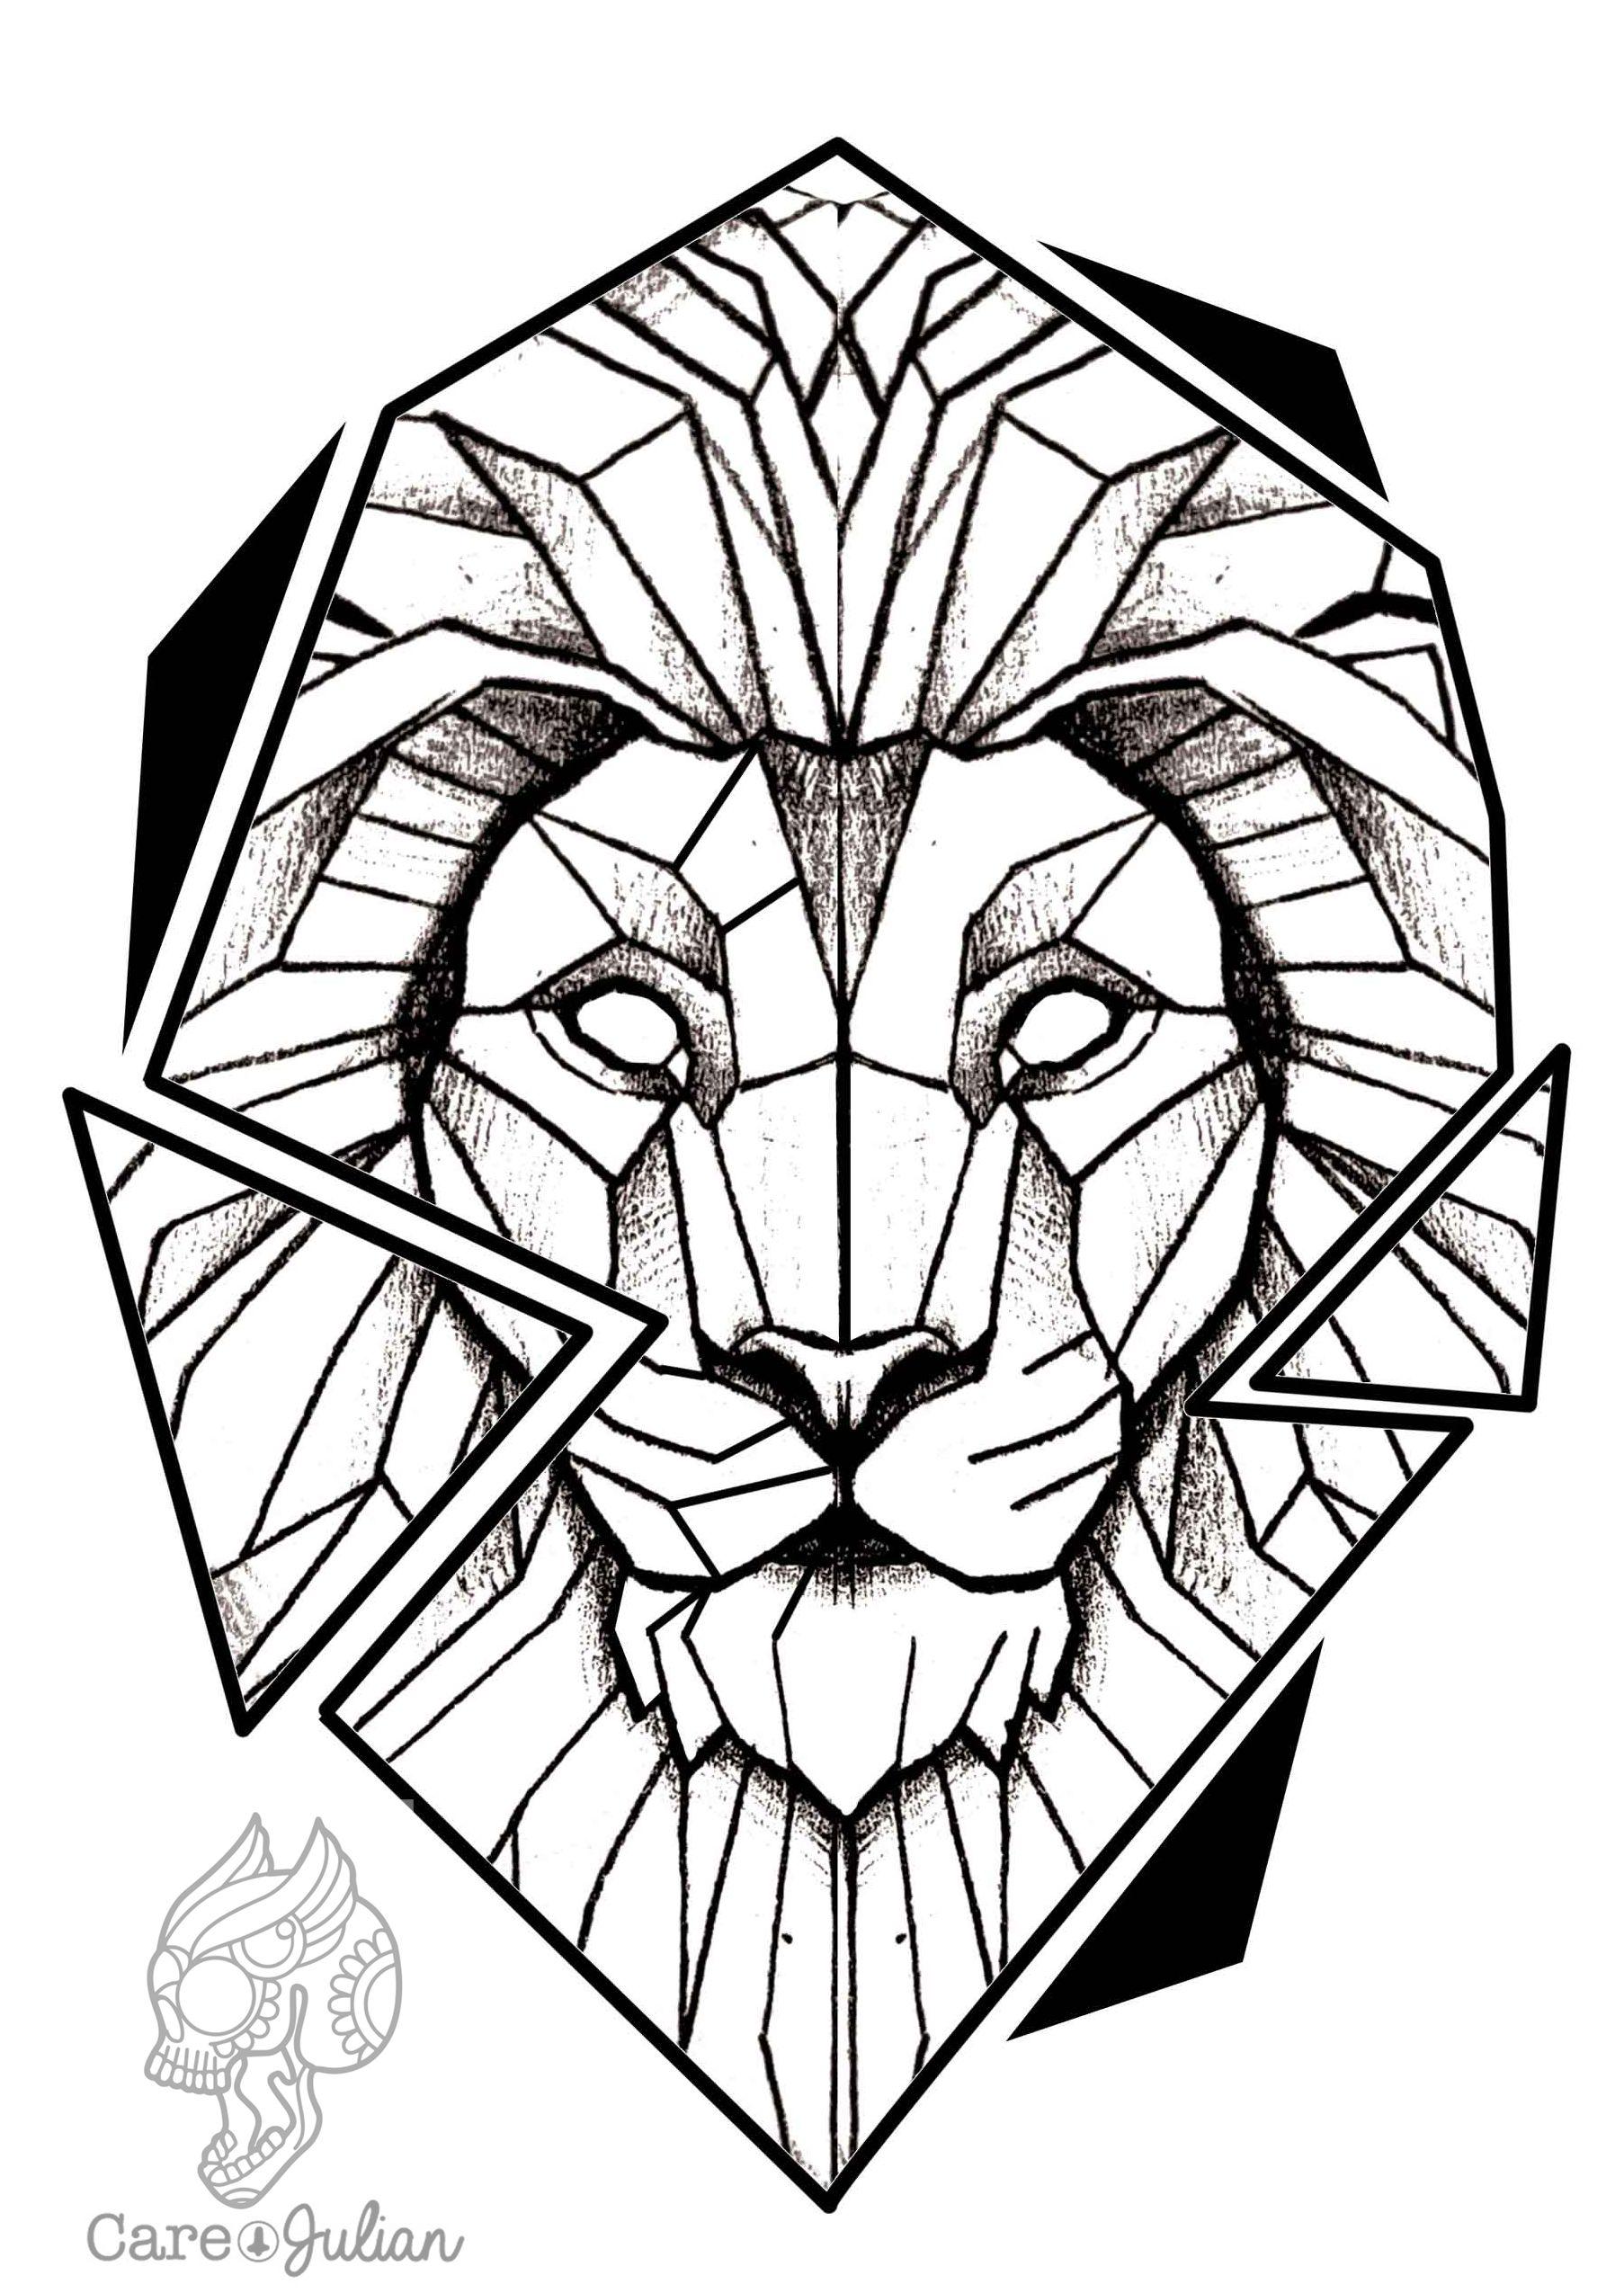 lion tattoo design leon tattoo lion design geometric dream house pinterest. Black Bedroom Furniture Sets. Home Design Ideas